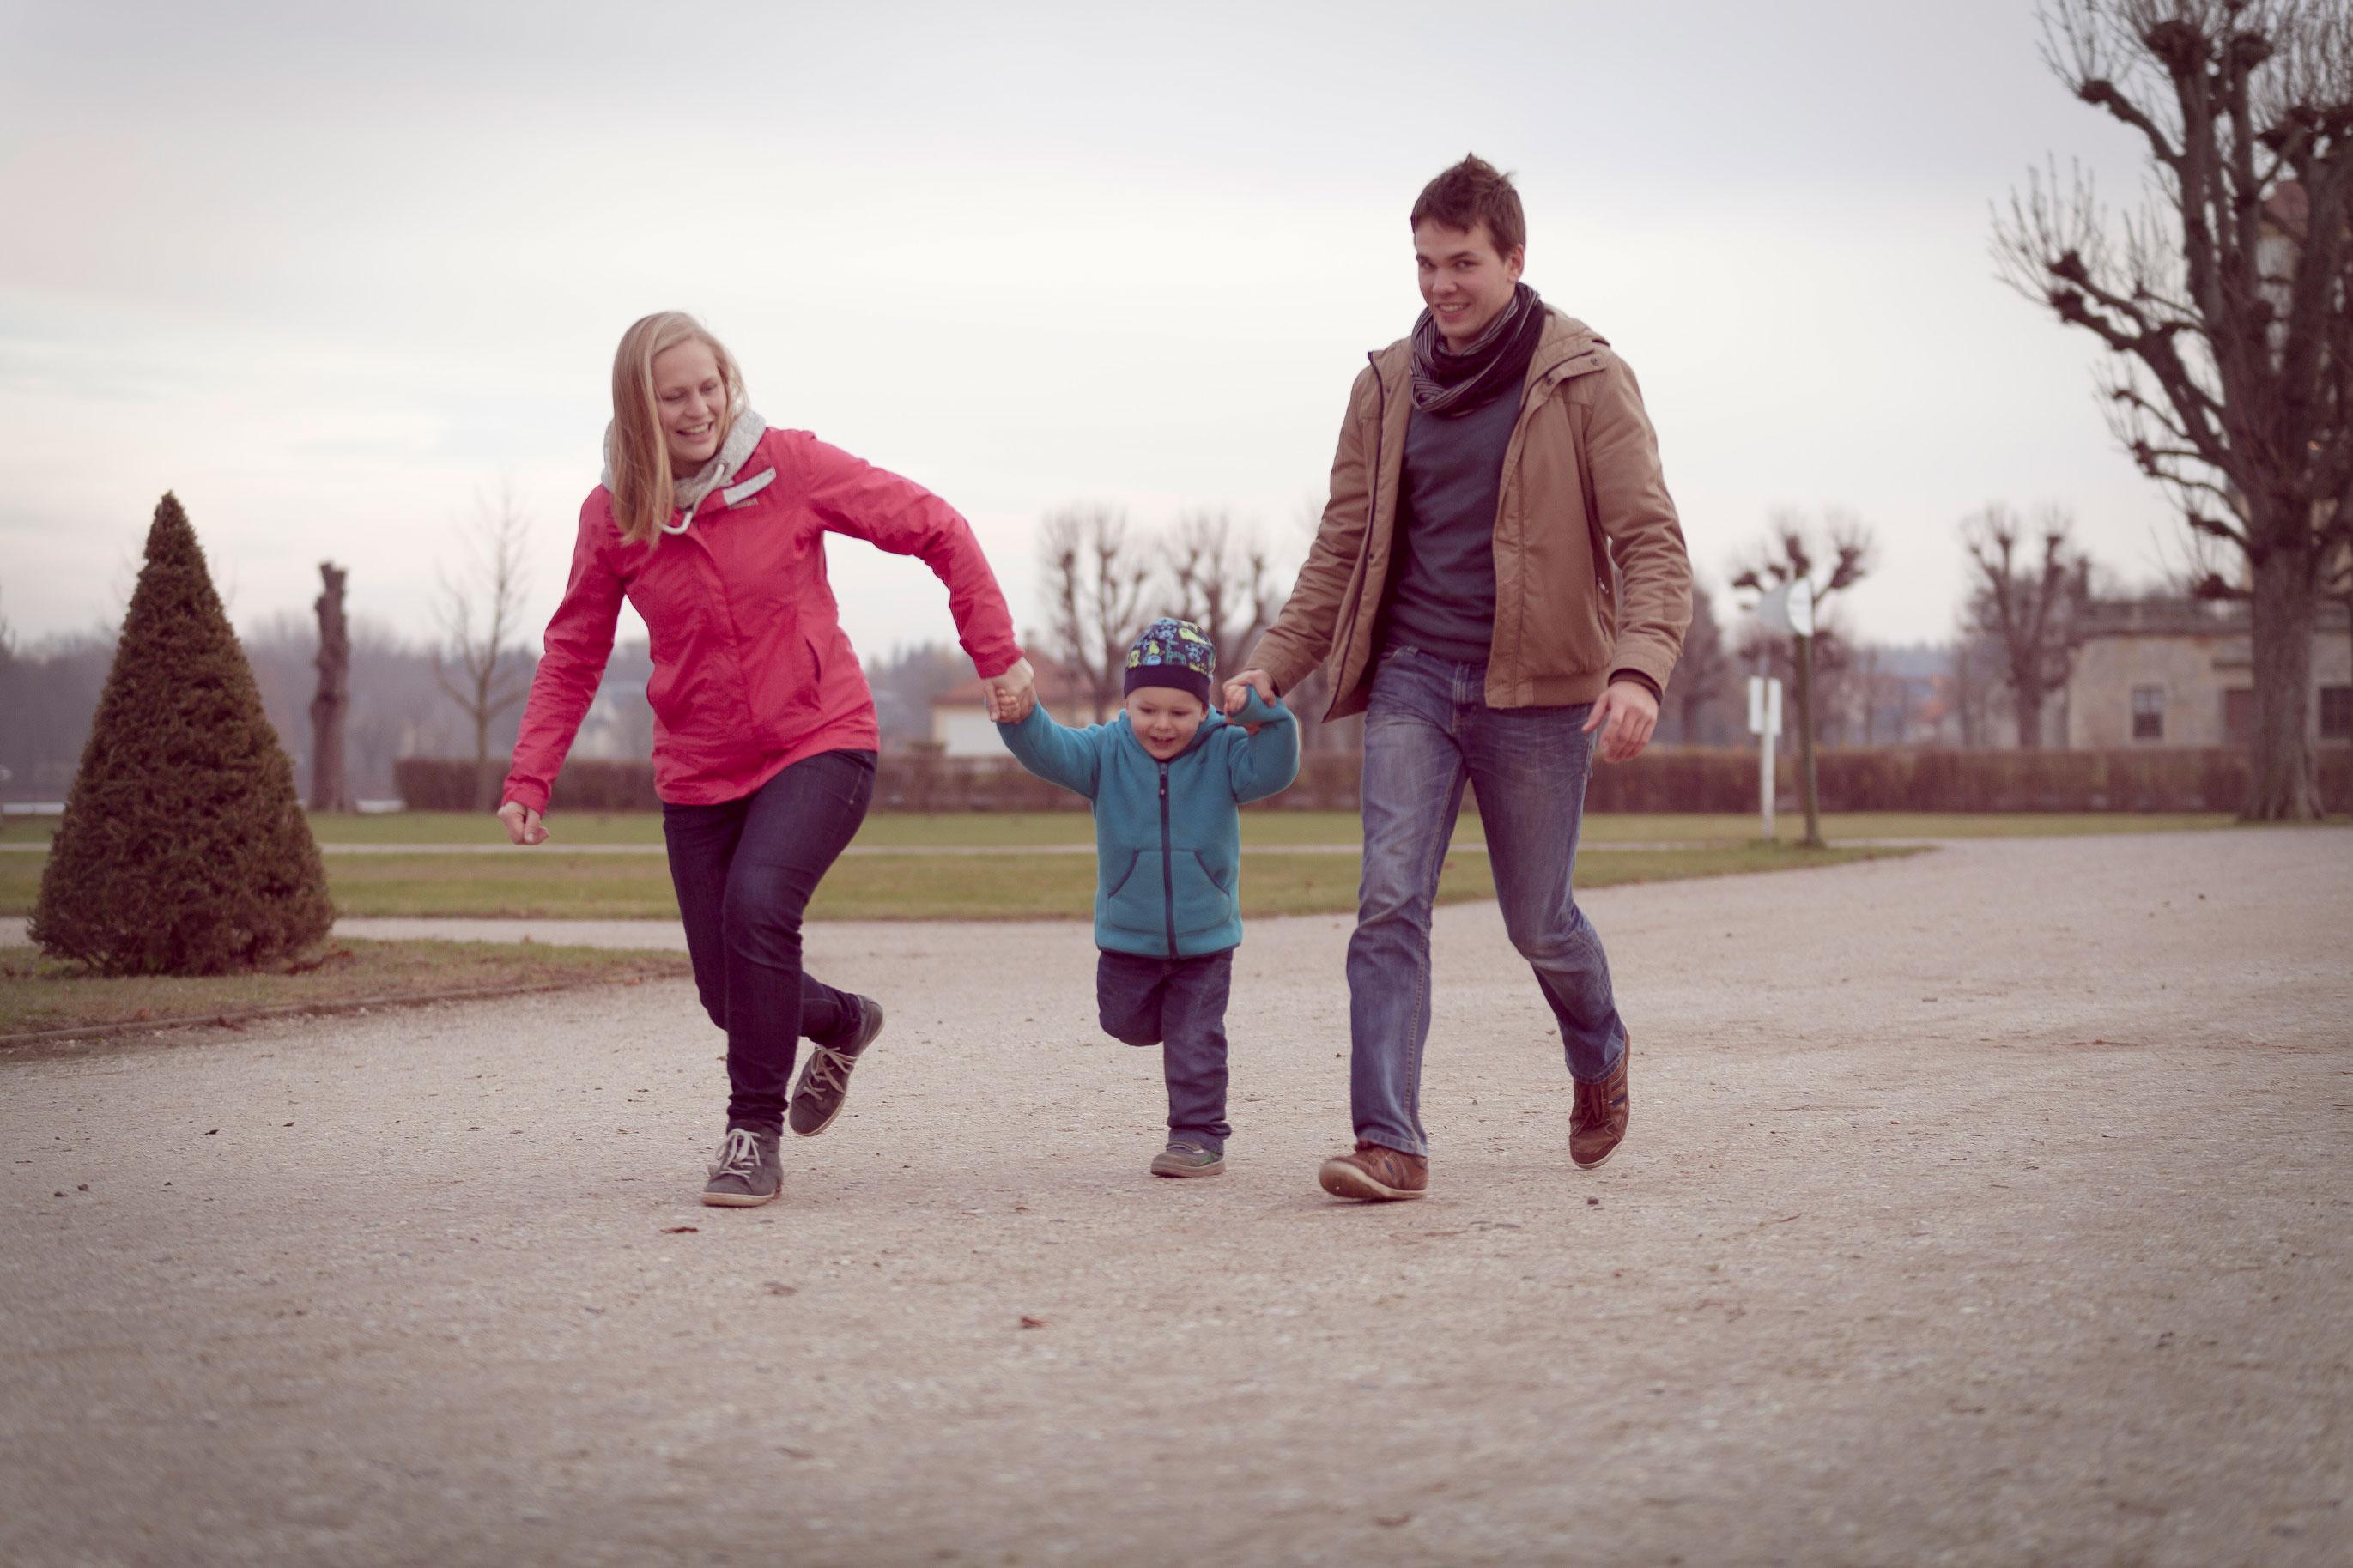 Familienfotograf Dresden Familienfotos Dresden Familienfotos Outdoor Familienfotos draußen Gruppenfotos Gruppenshooting Familienshooting